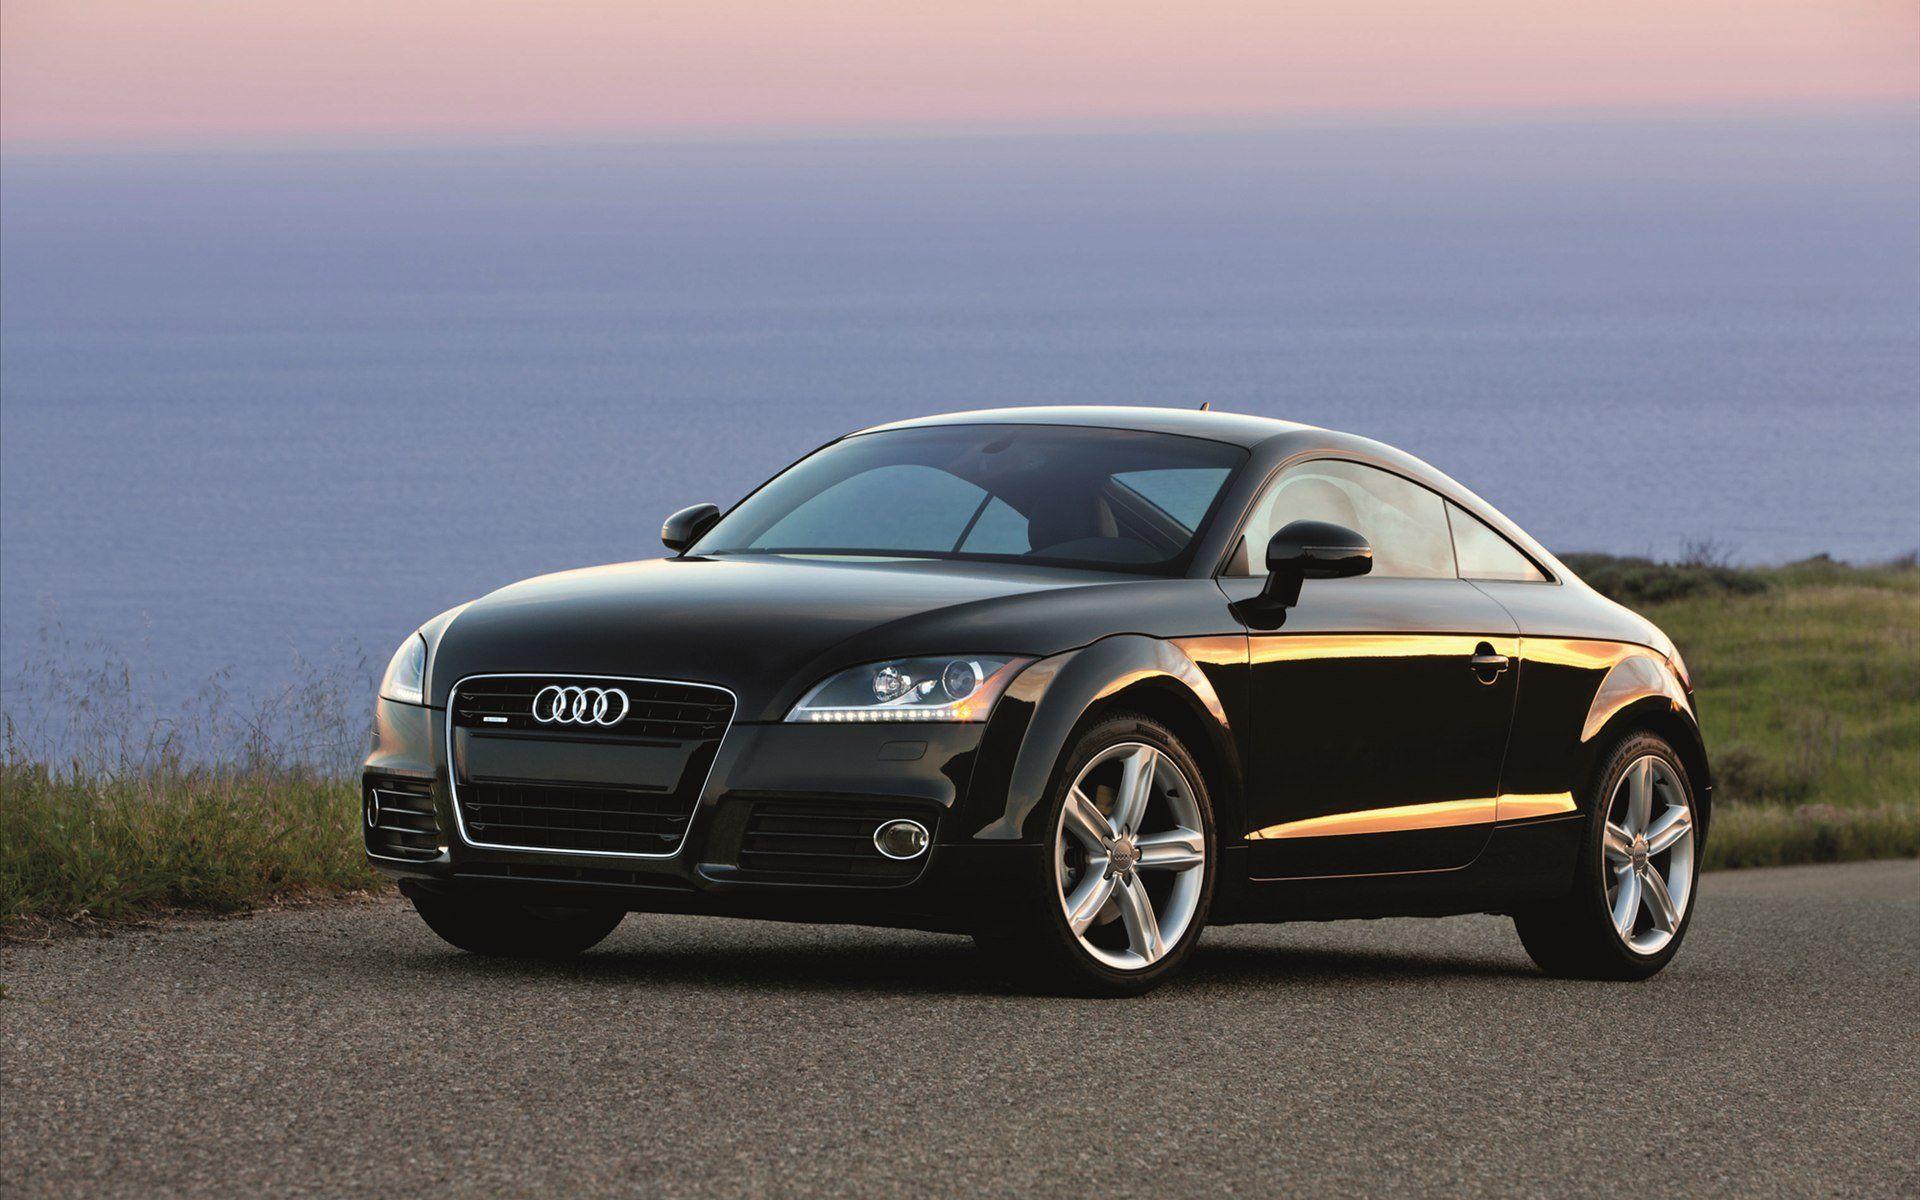 Kelebihan Audi A6 Coupe Harga